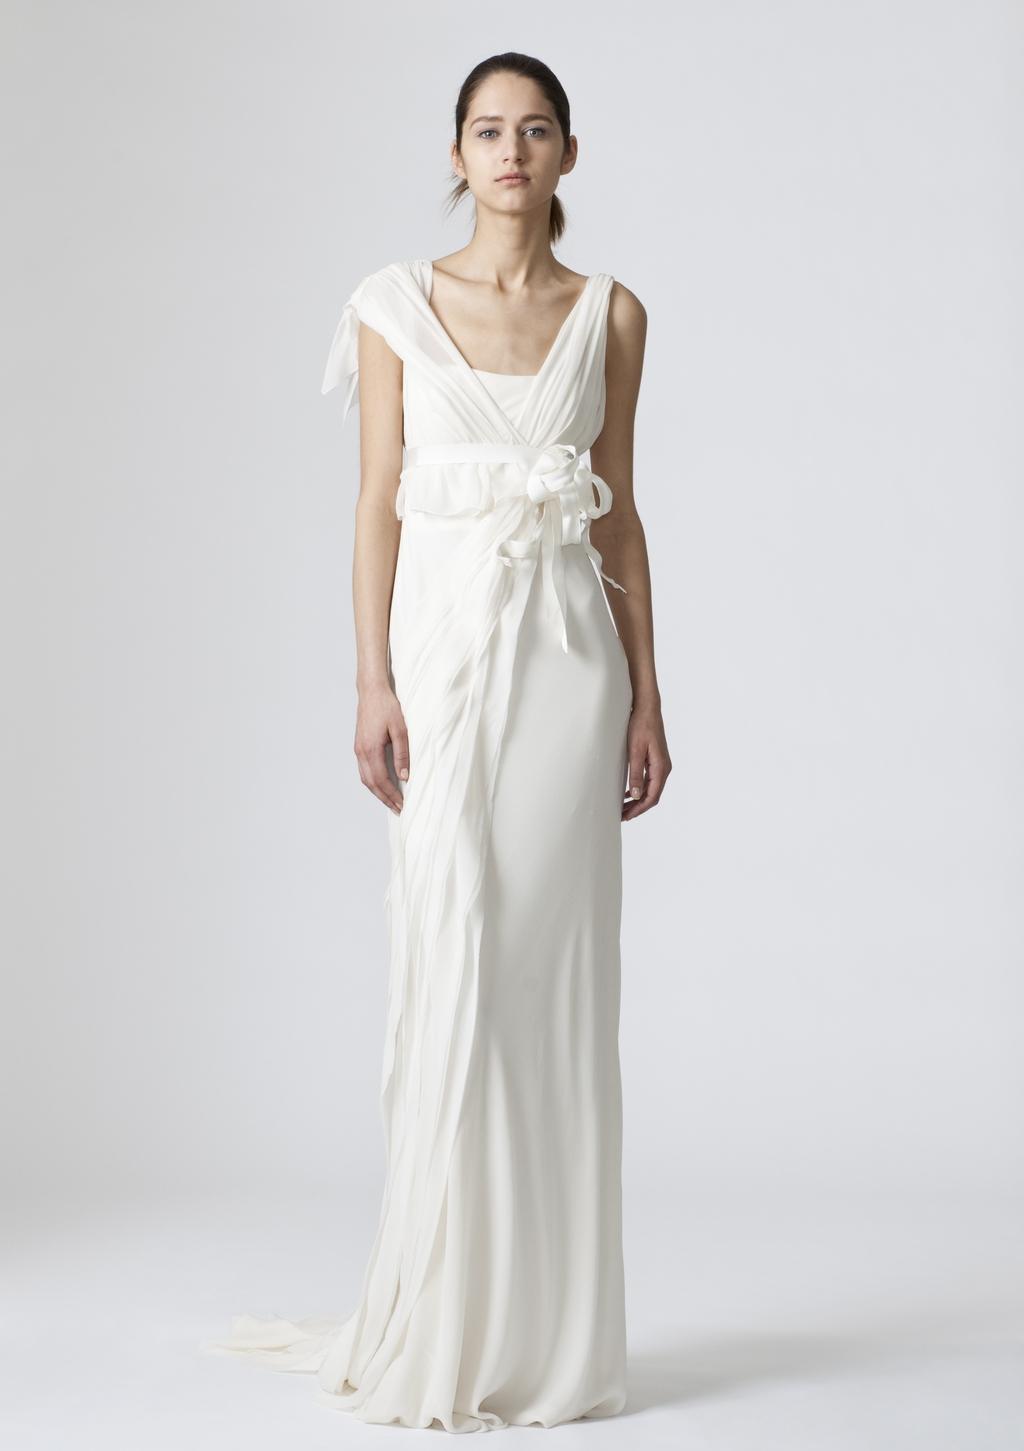 Vera-wang-wedding-dresses-spring-2010-7.full